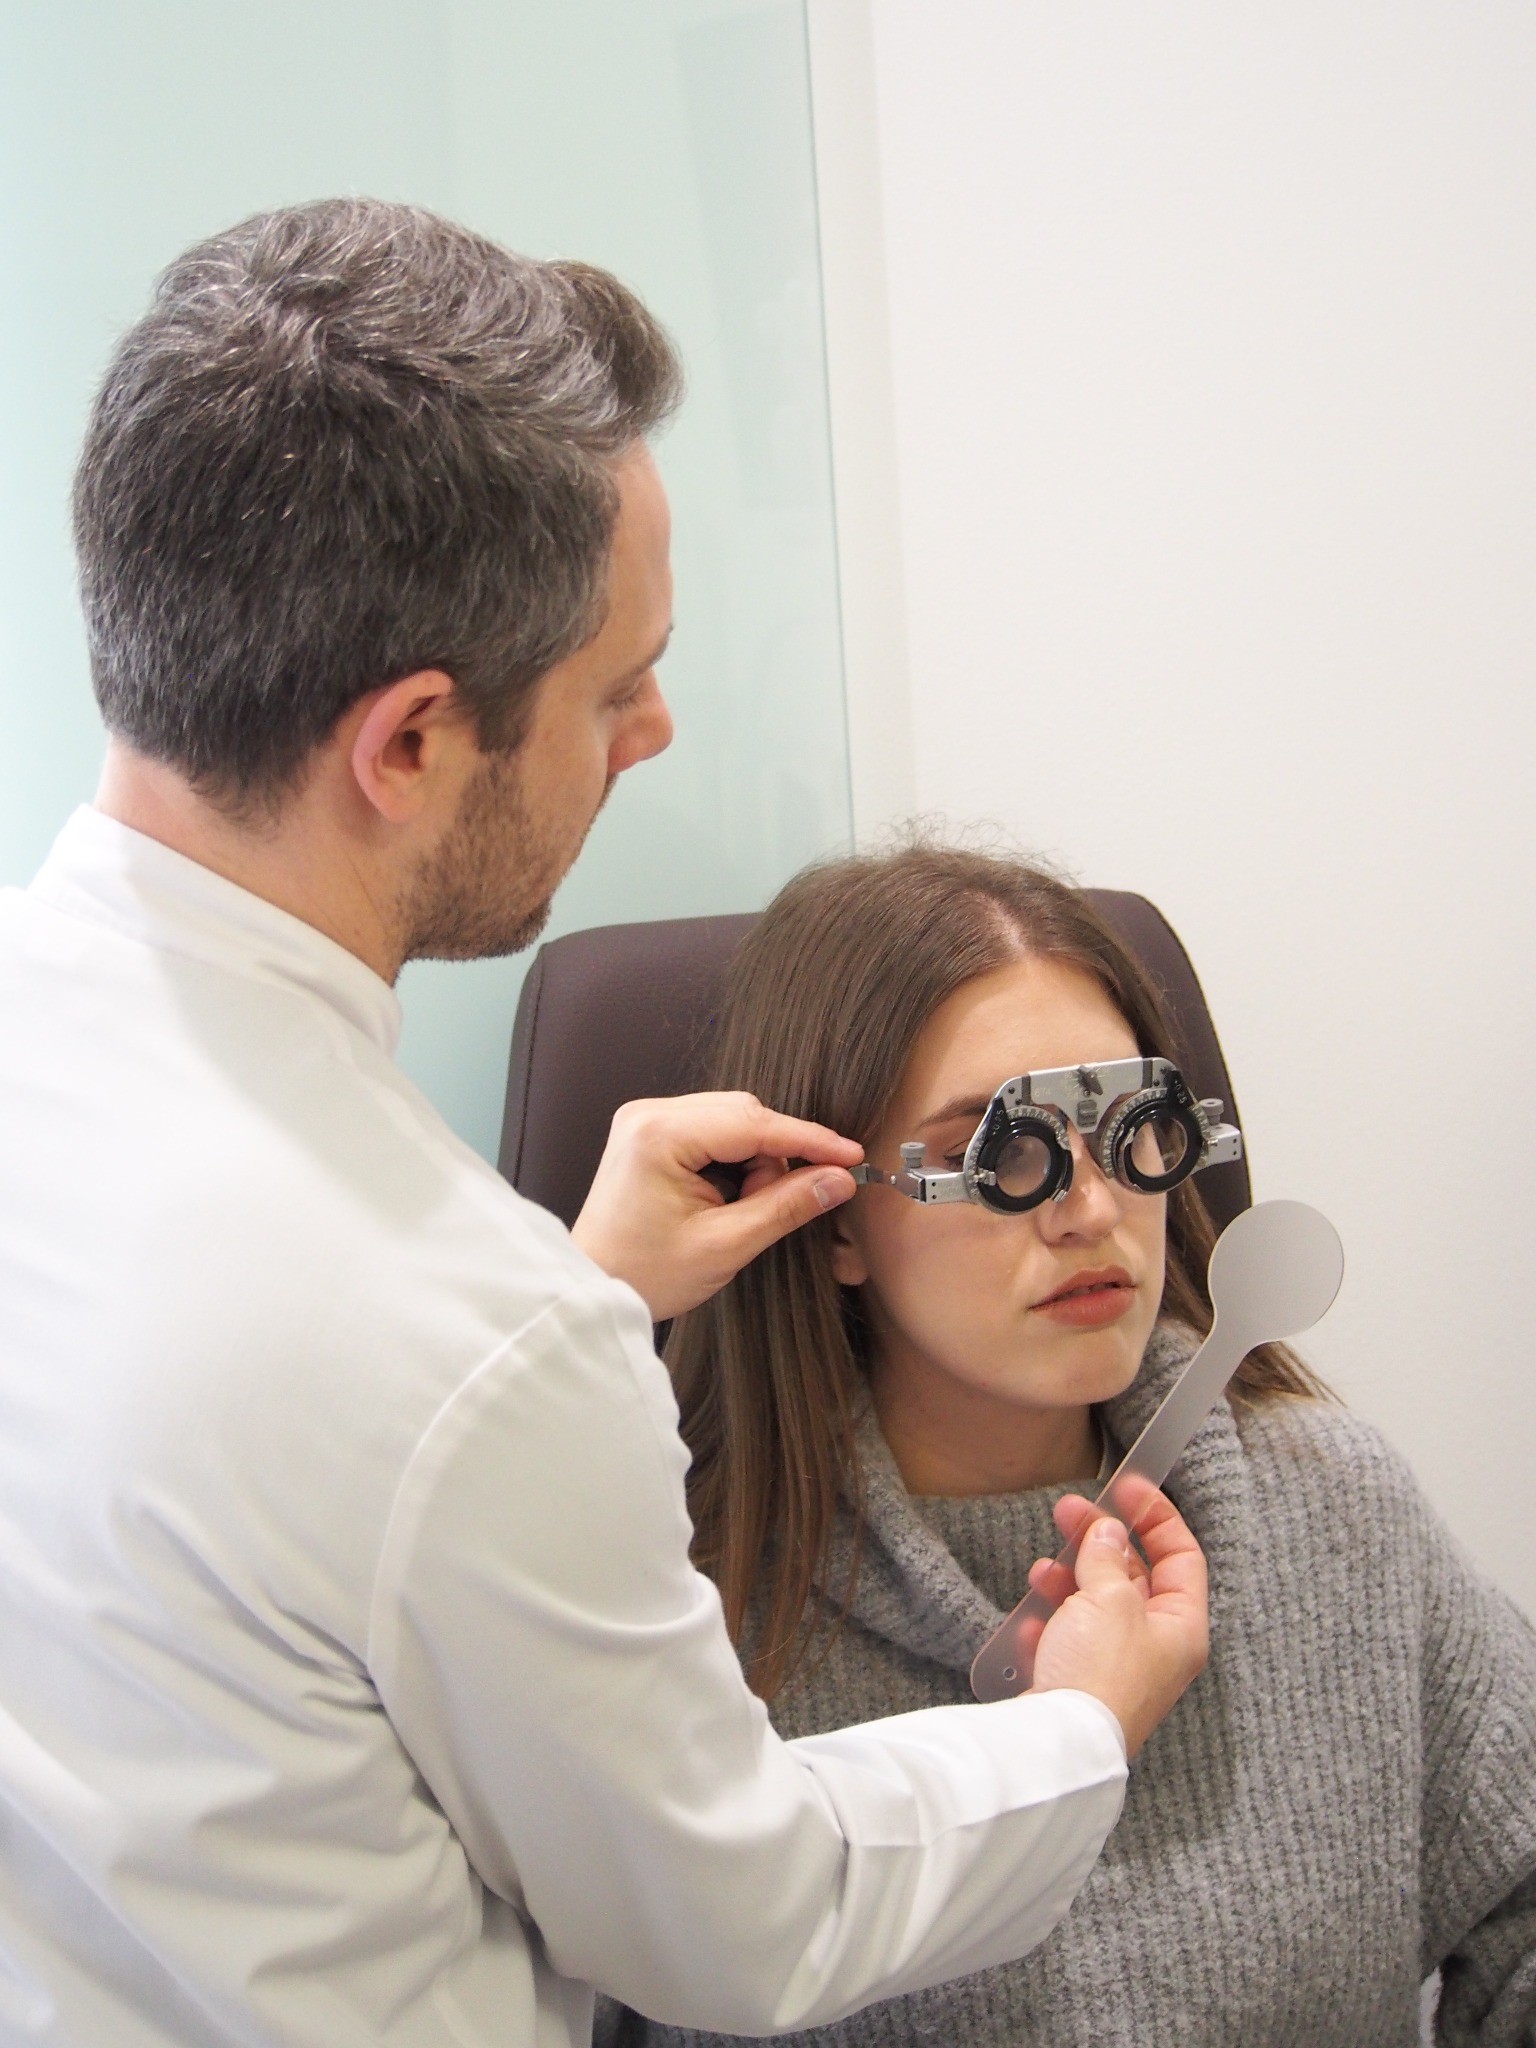 Belavista Óptica e Optometría